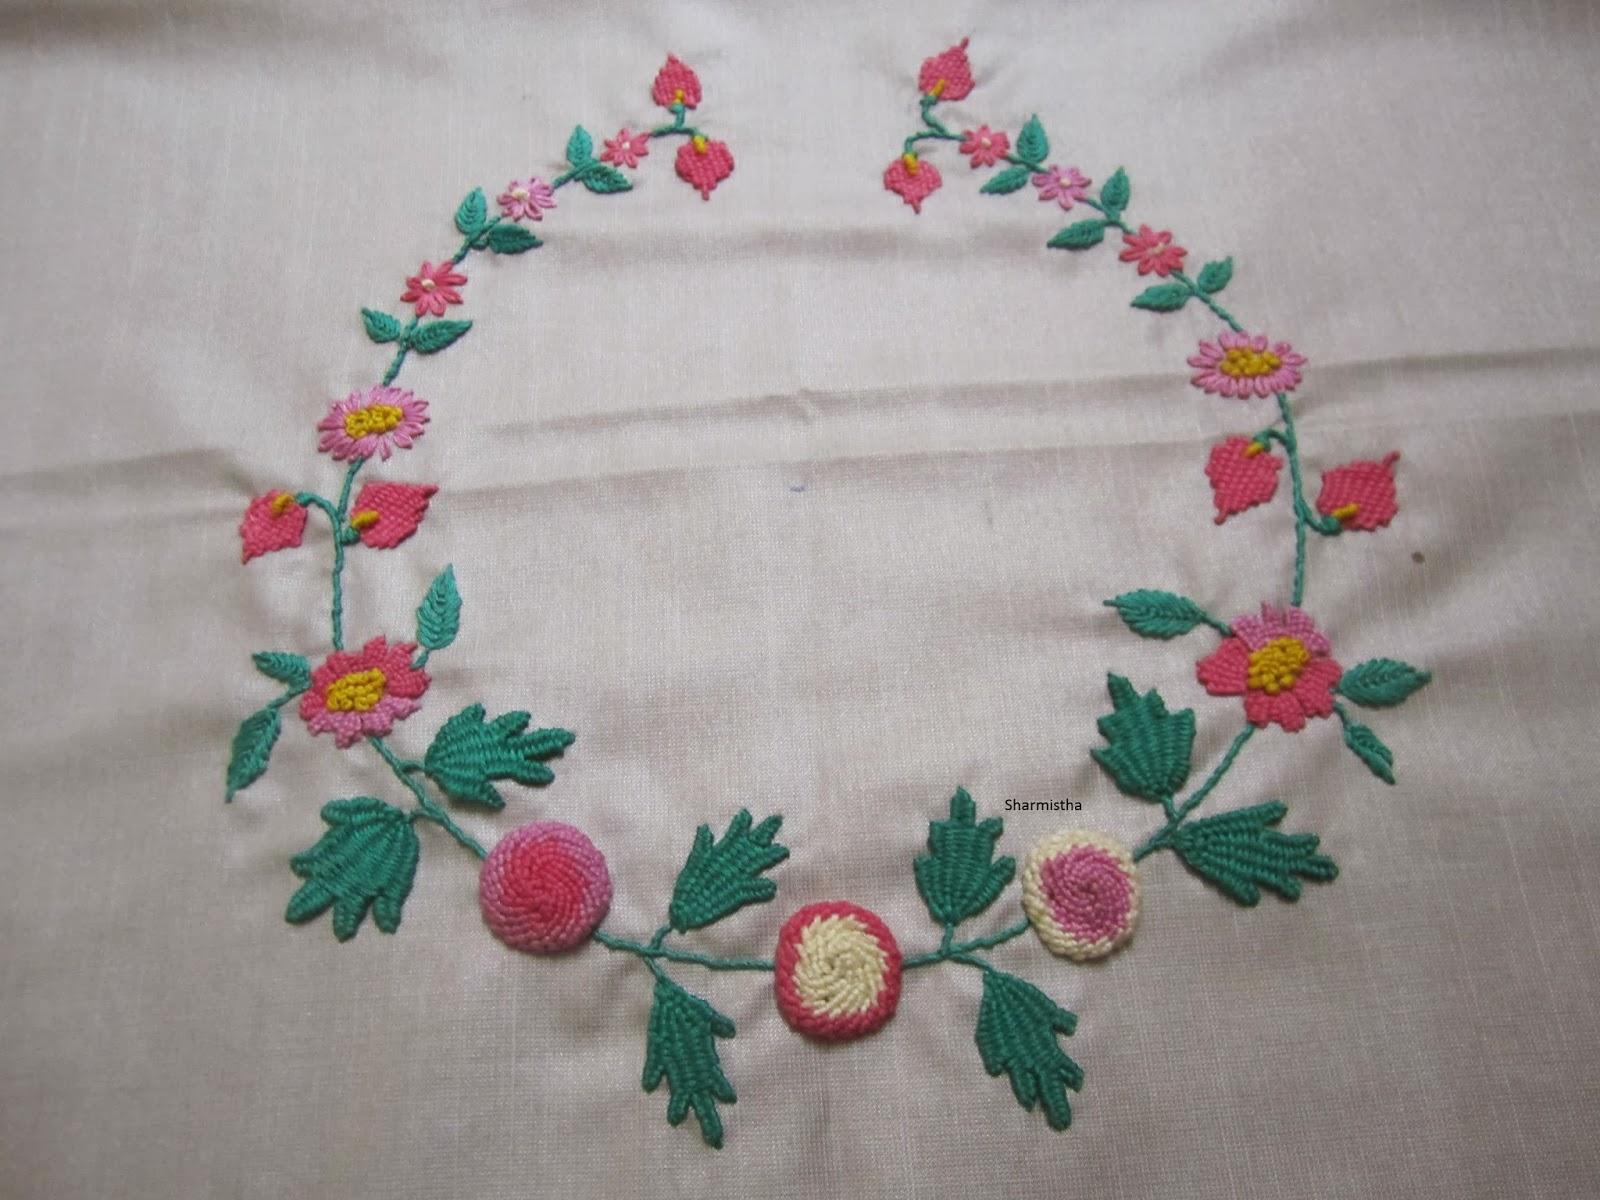 How to make hand embroidery lazy dazy stitch in urduhindi